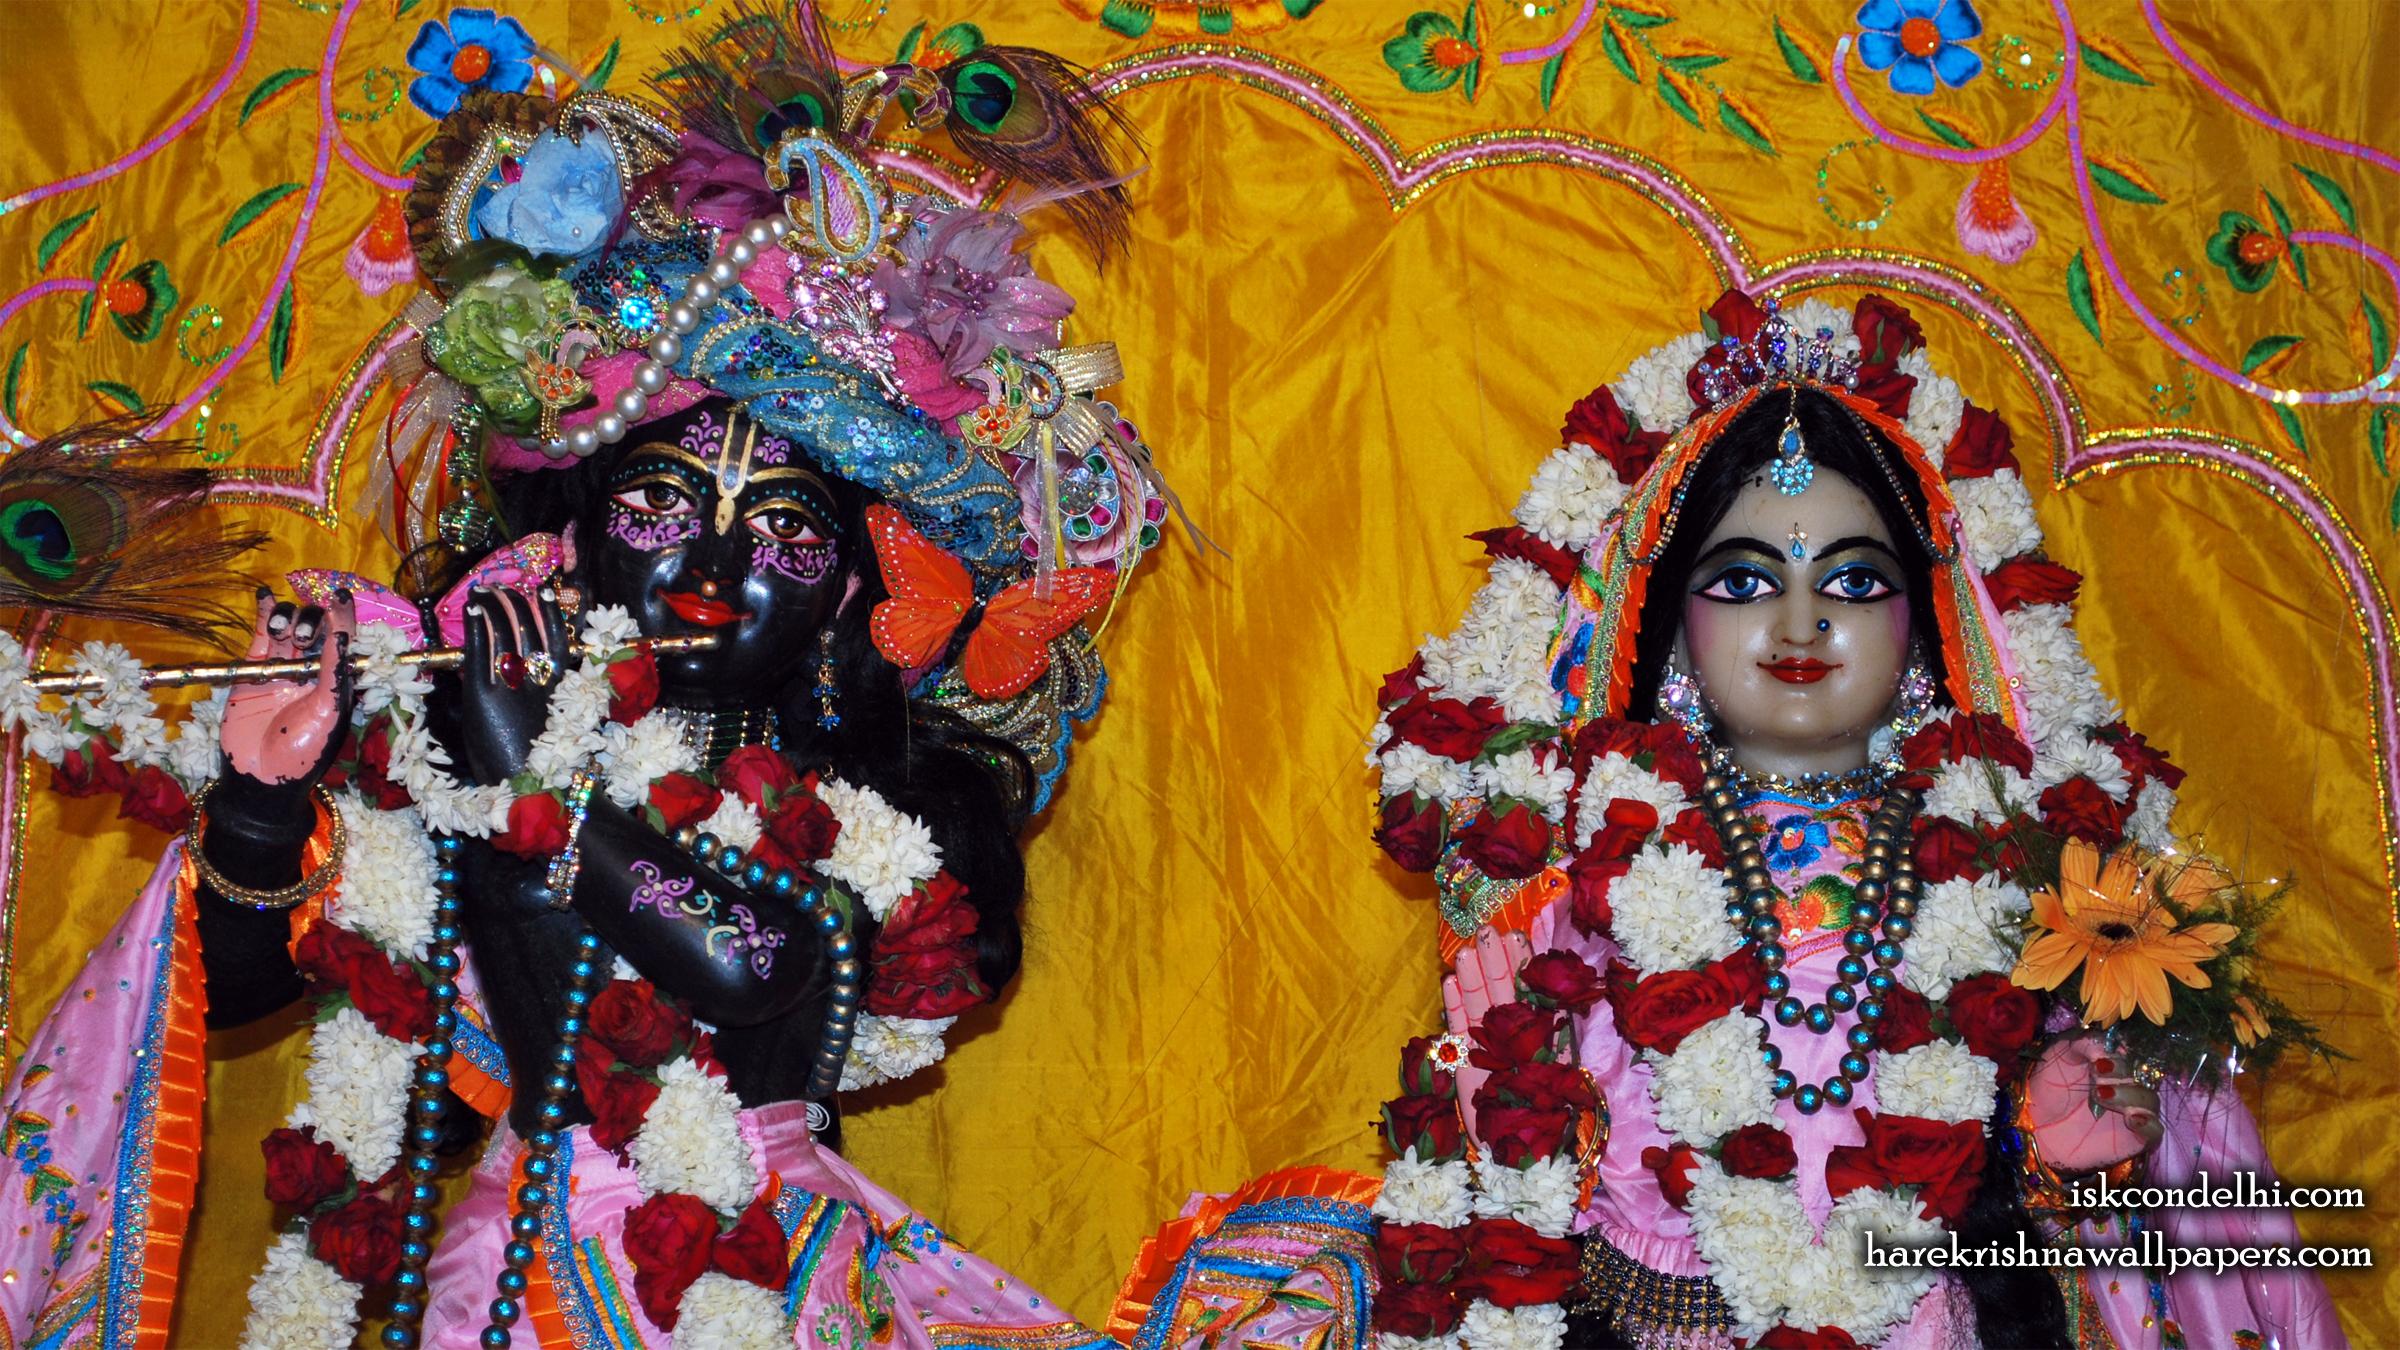 Sri Sri Radha Parthasarathi Close up Wallpaper (013) Size 2400x1350 Download